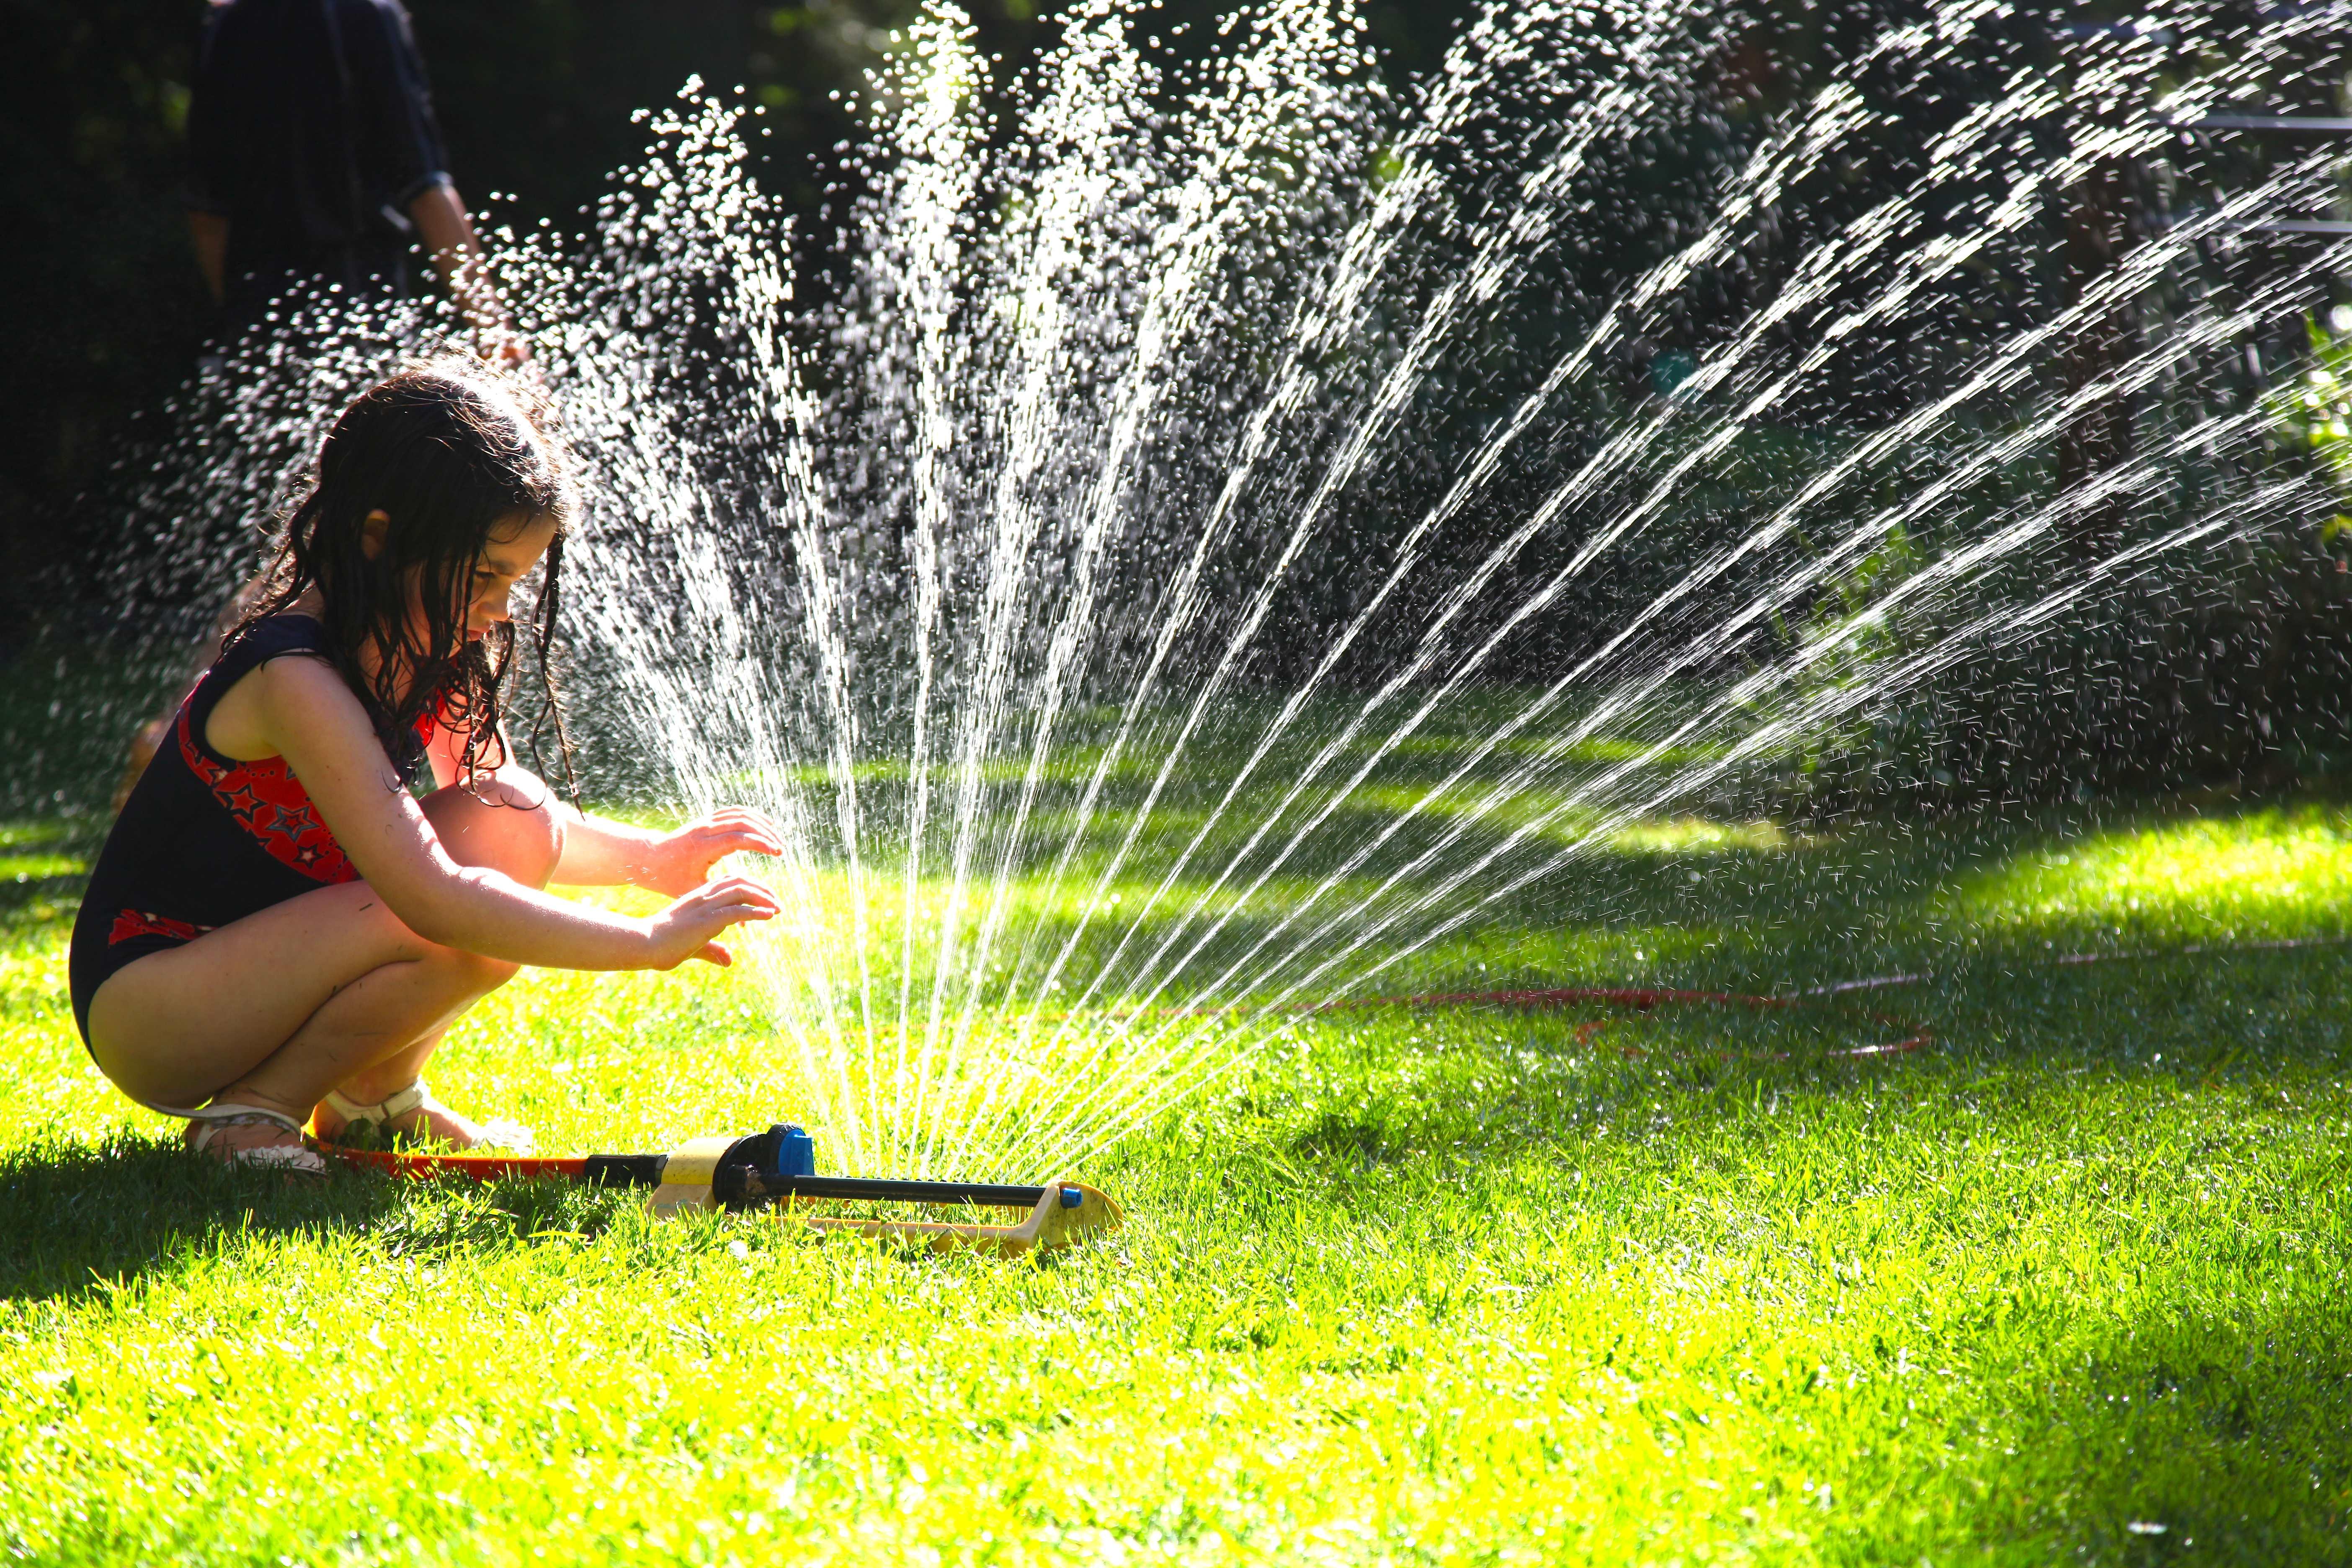 How Toxic Is Your Garden Hose? - Trash Backwards Blog